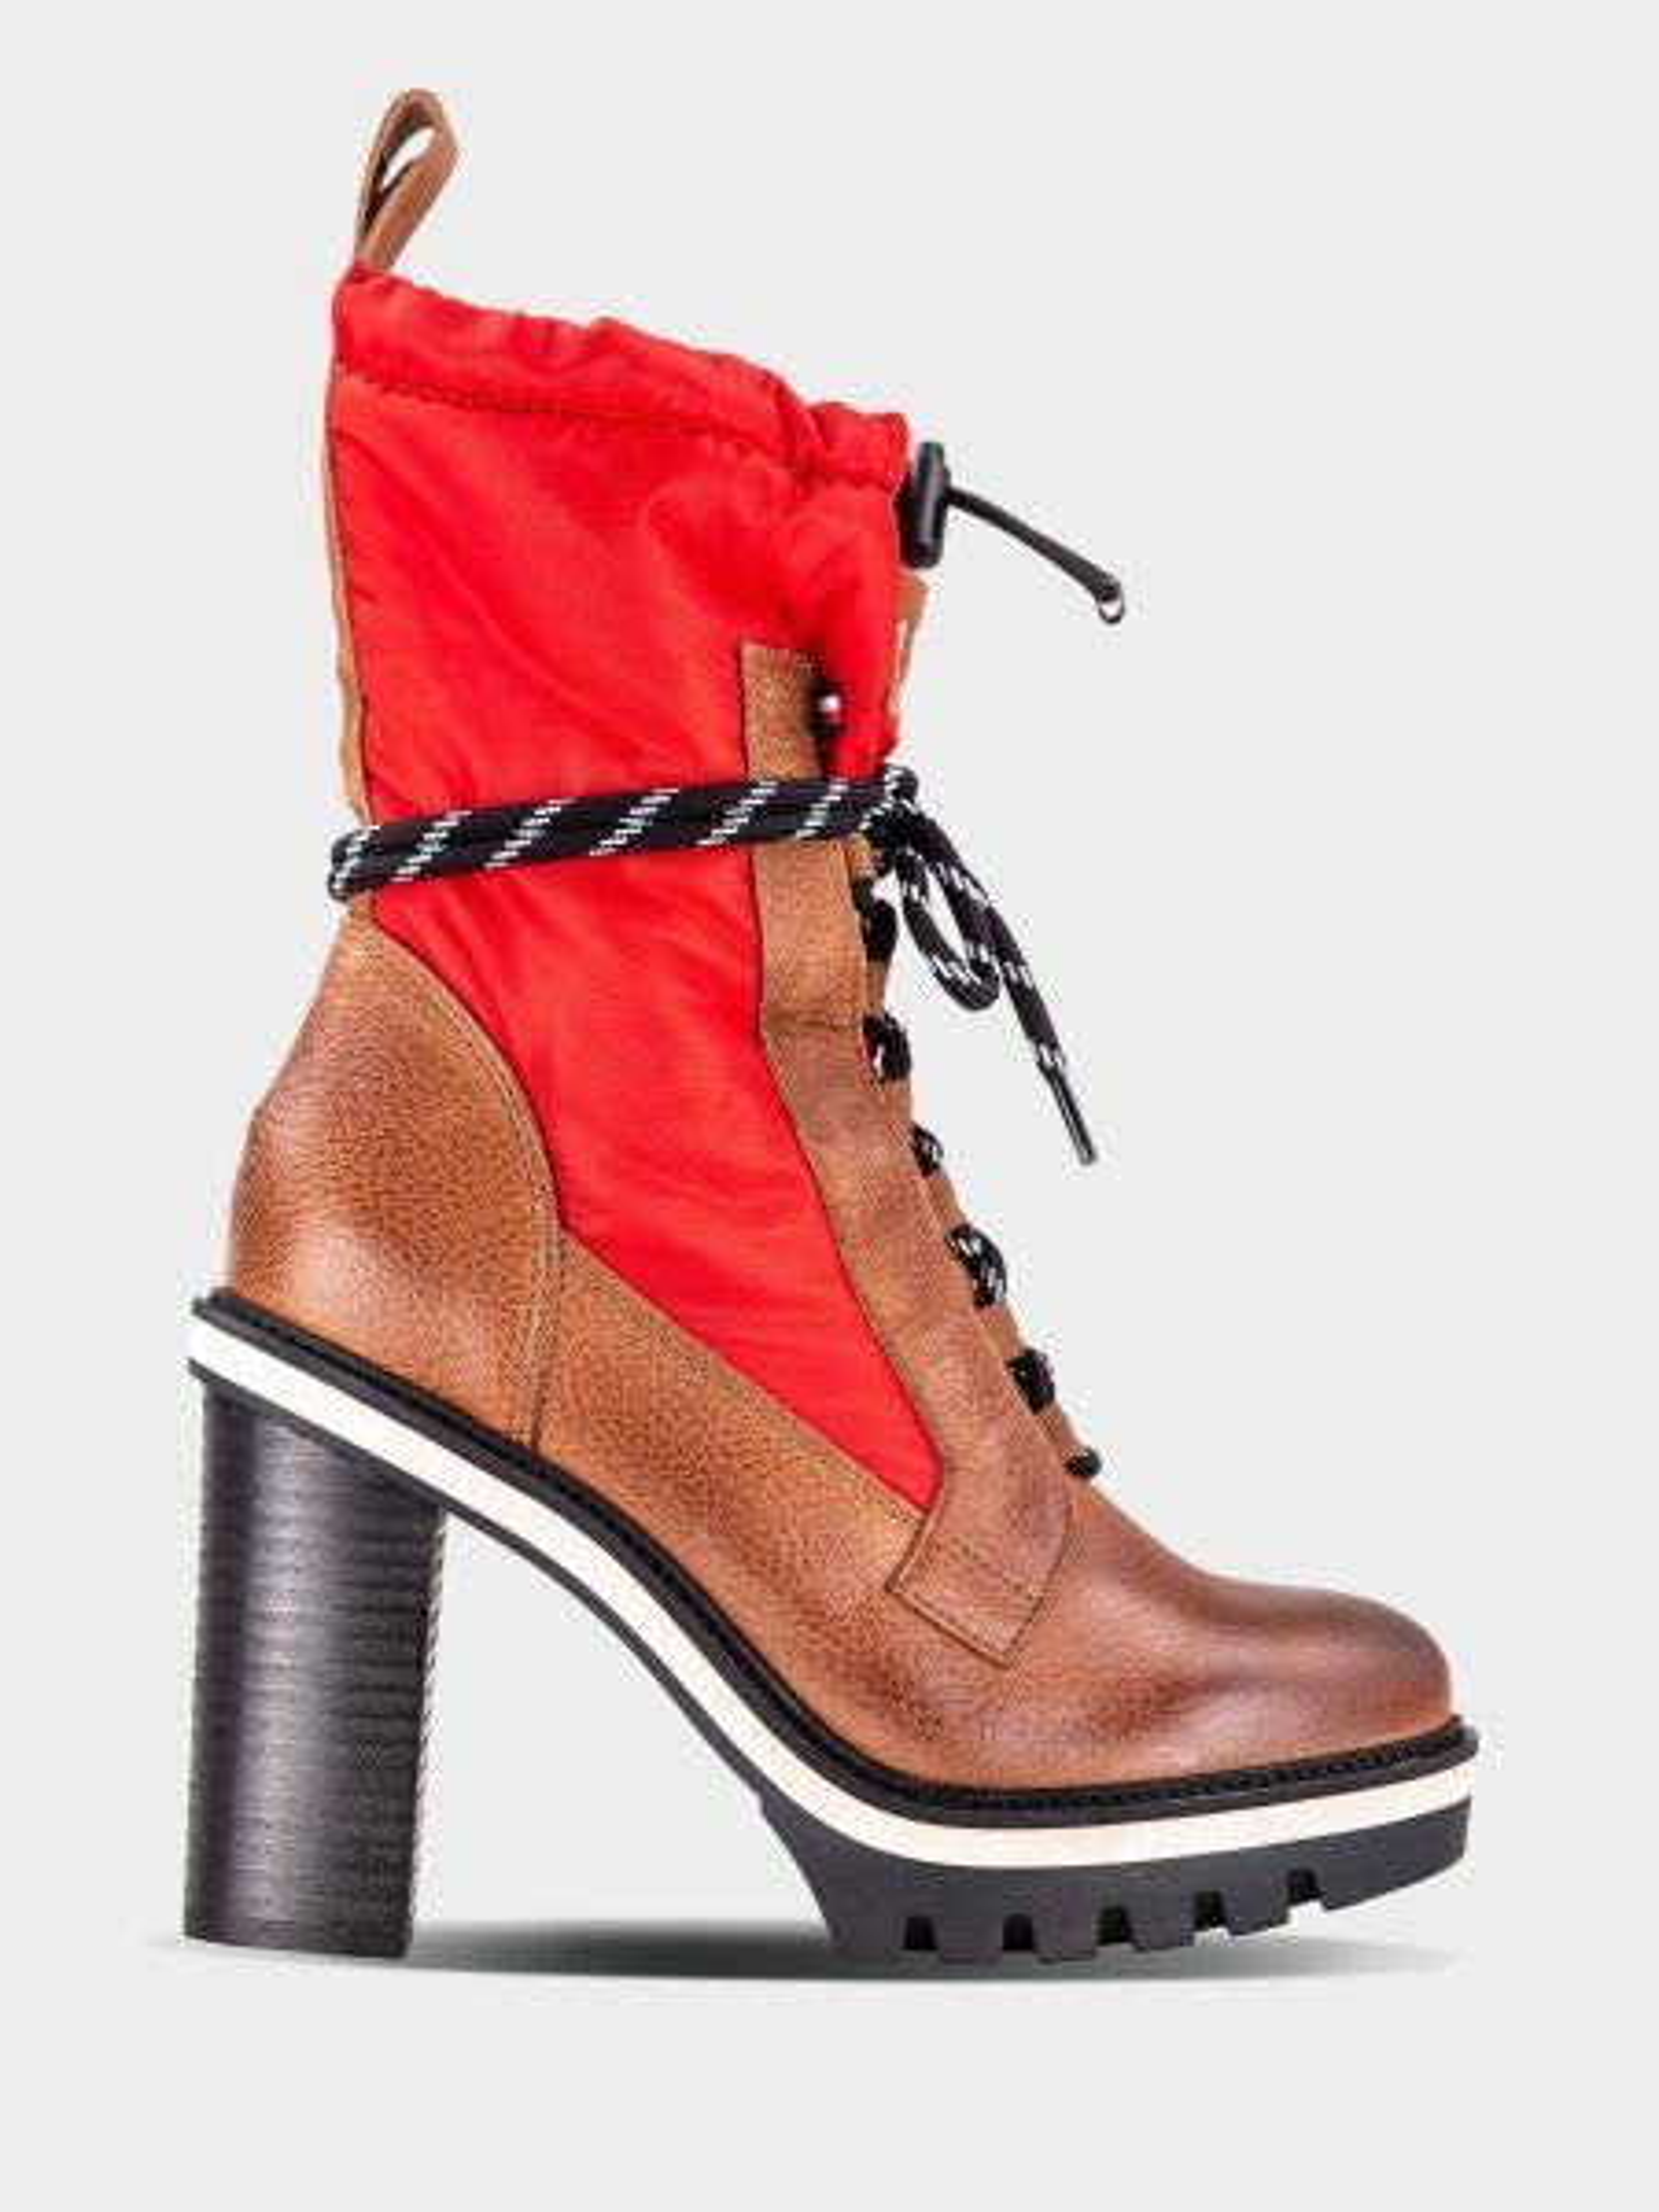 Сапоги для женщин Tommy Hilfiger FASHION WINTER TD1367 брендовая обувь, 2017